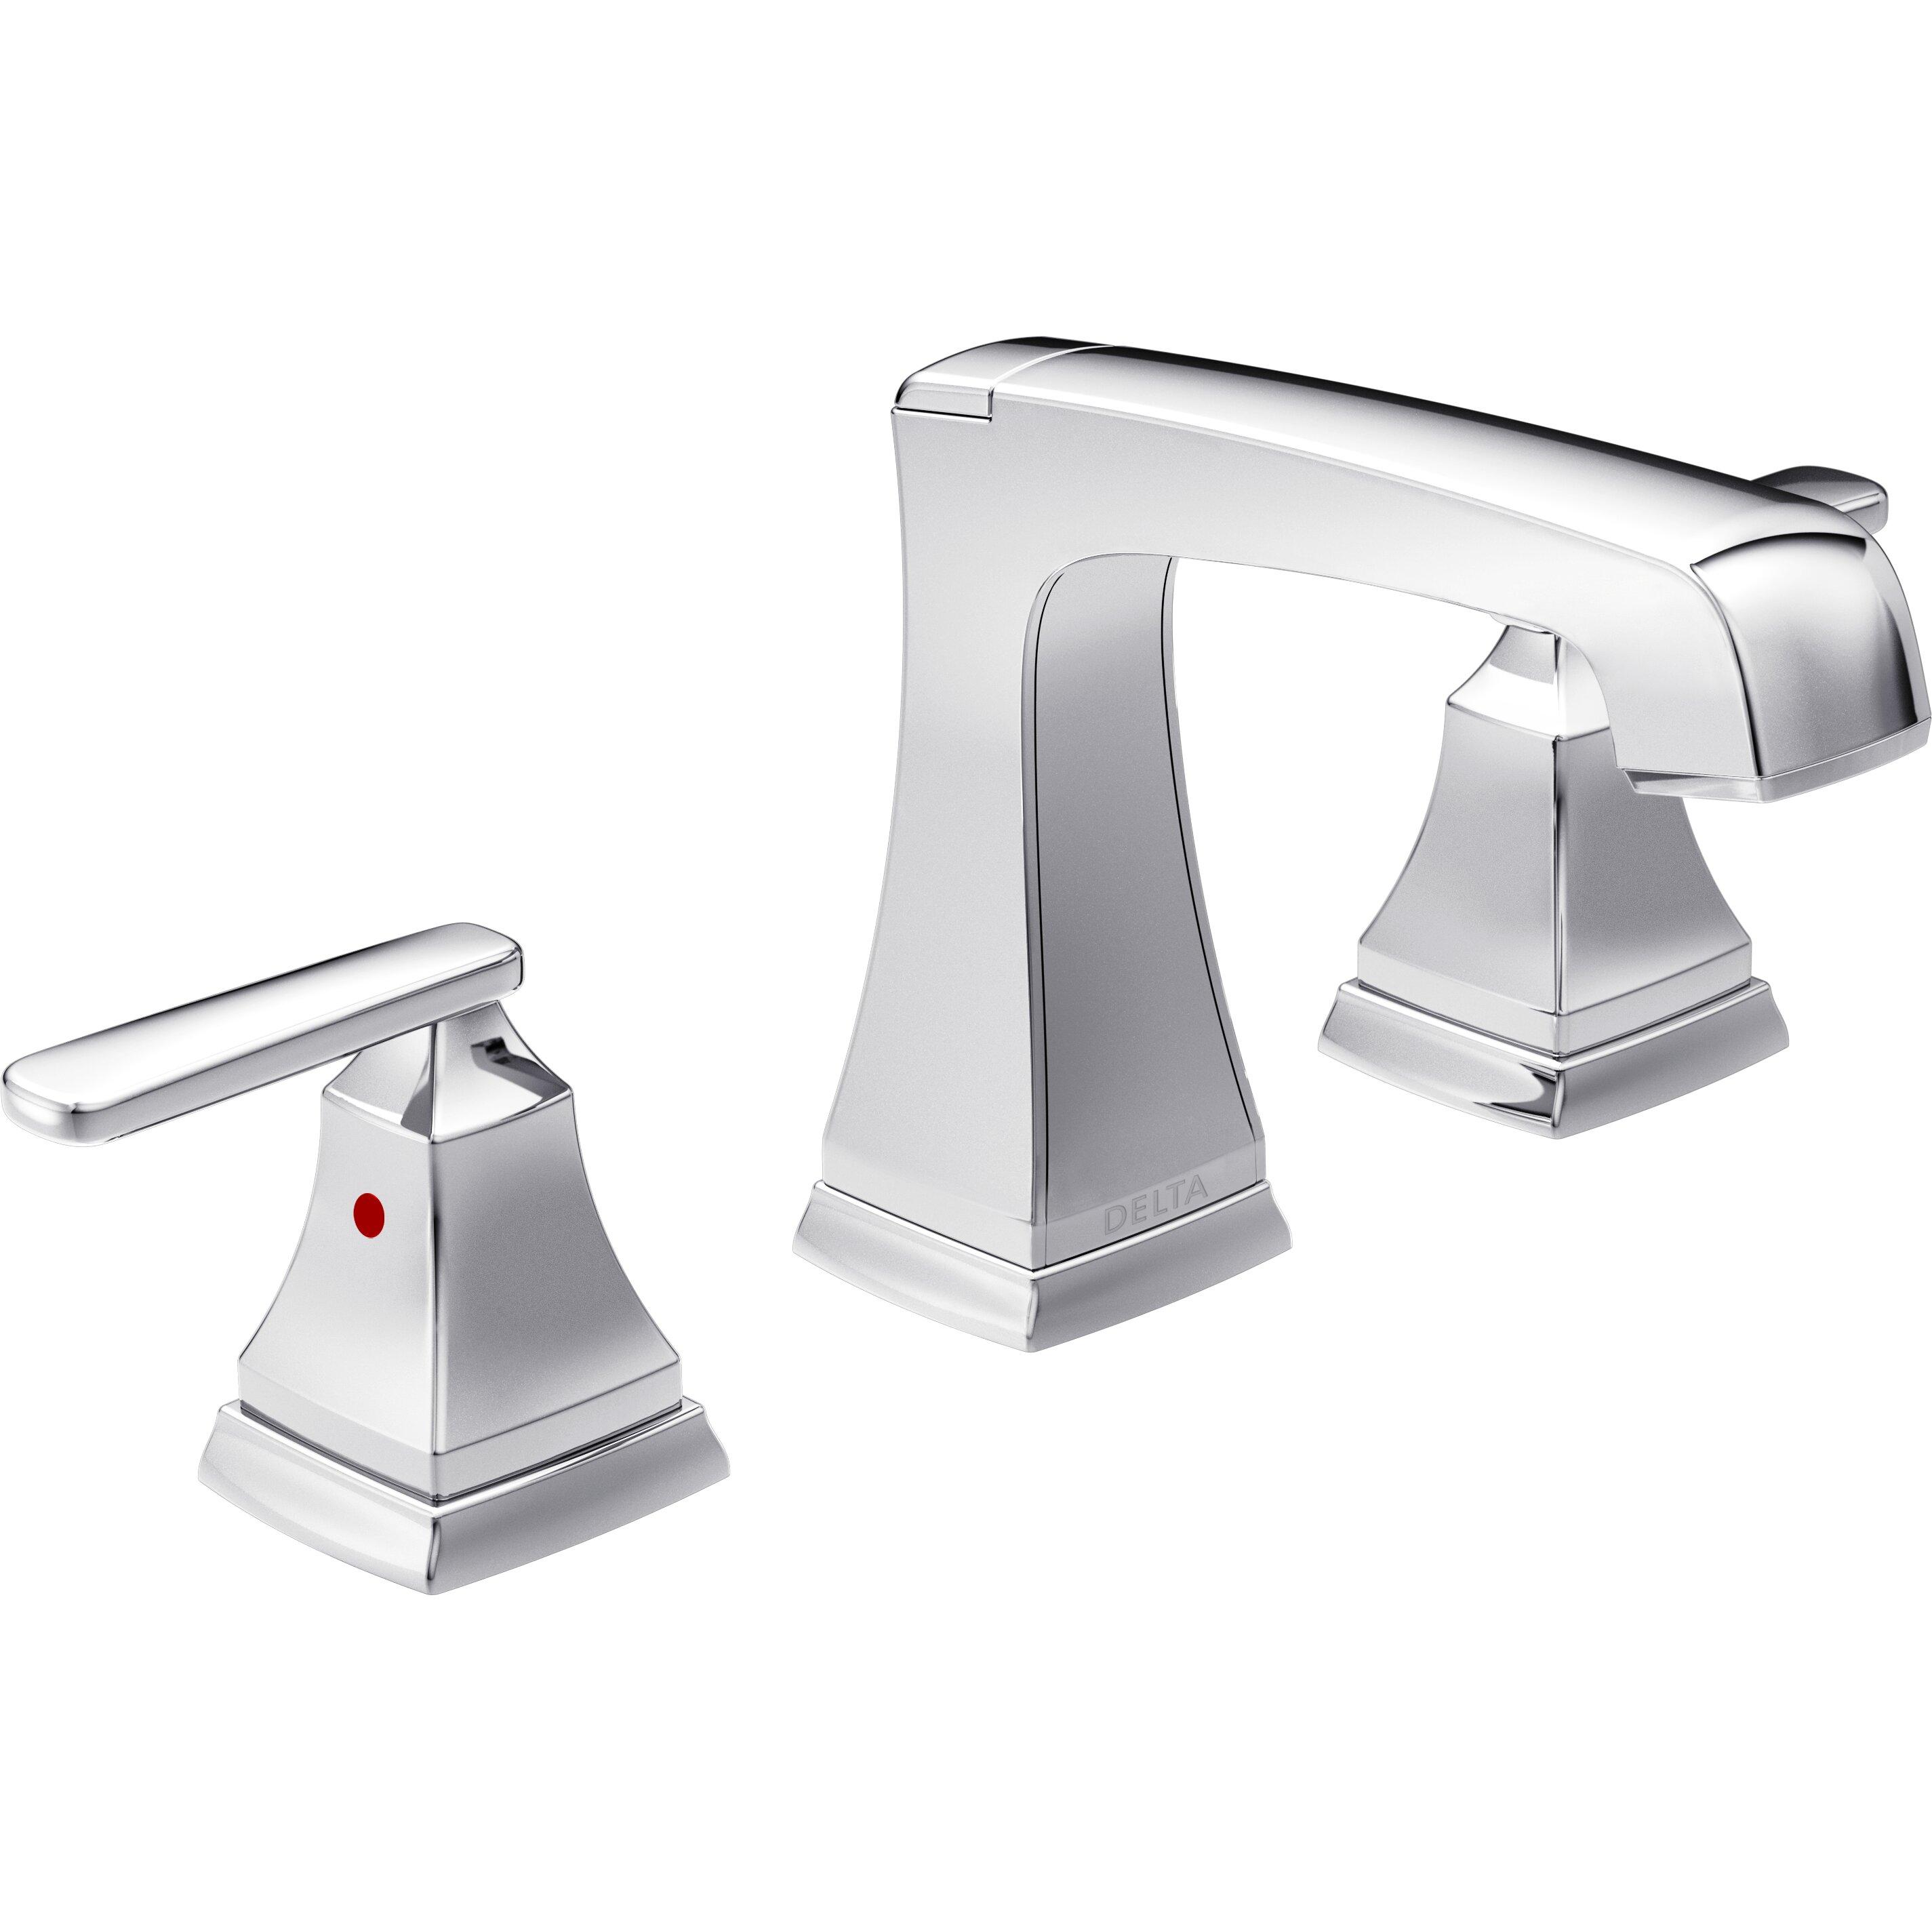 Delta Ashlyn Standard Bathroom Faucet Lever Handle With Drain  Delta  Bathroom Faucet Repair Instructions EnWe. Delta Bathroom Faucet Repair Instructions